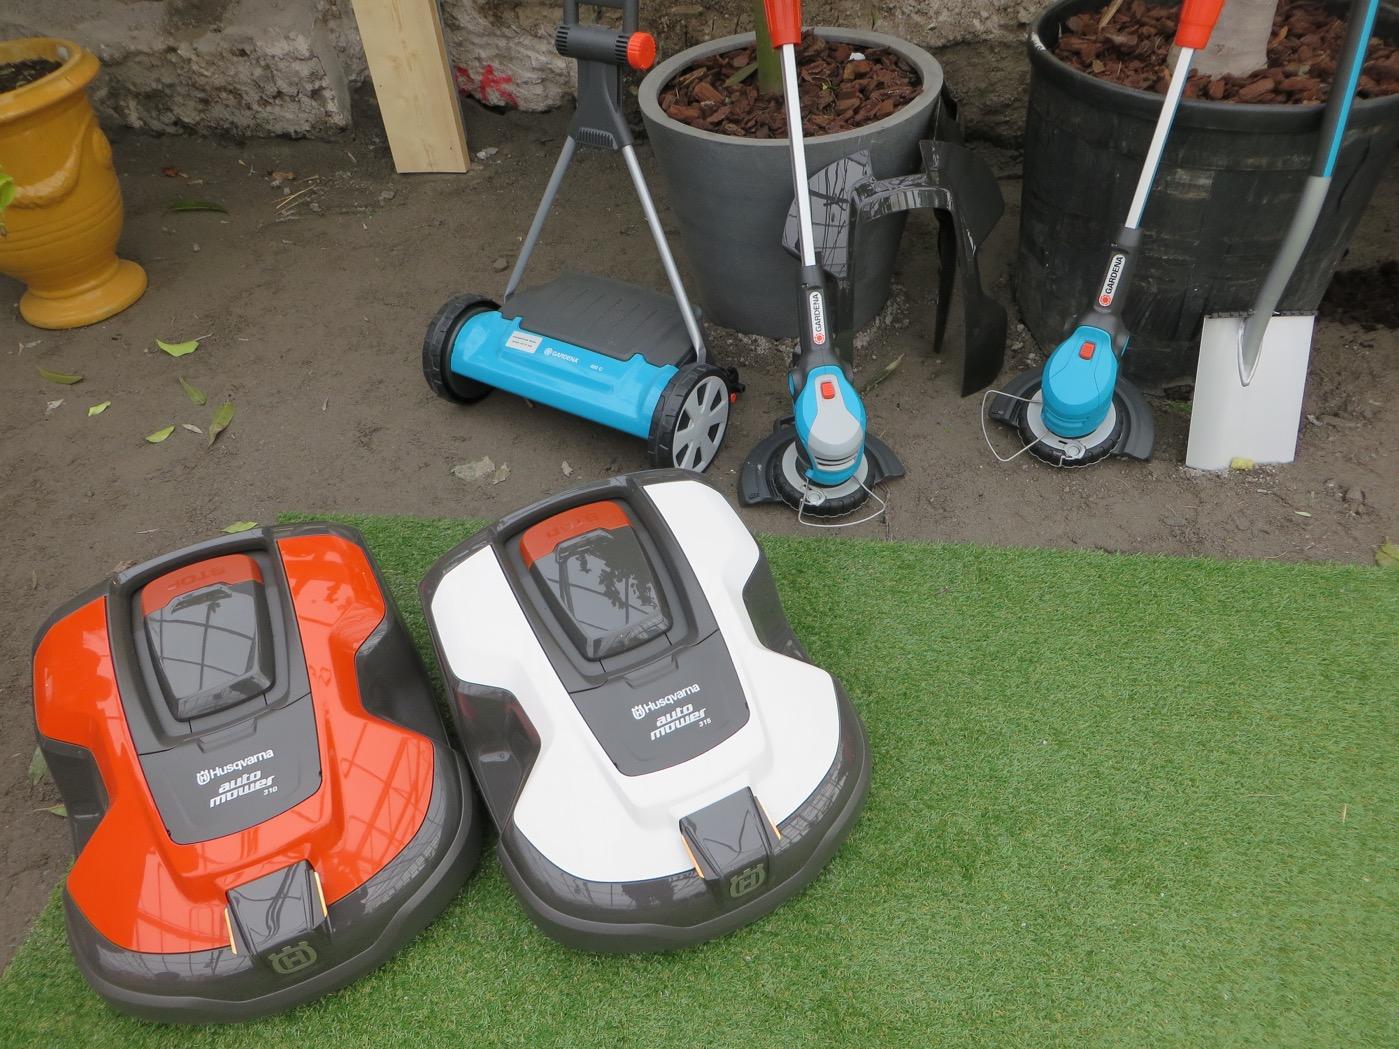 Robotgräsklippare